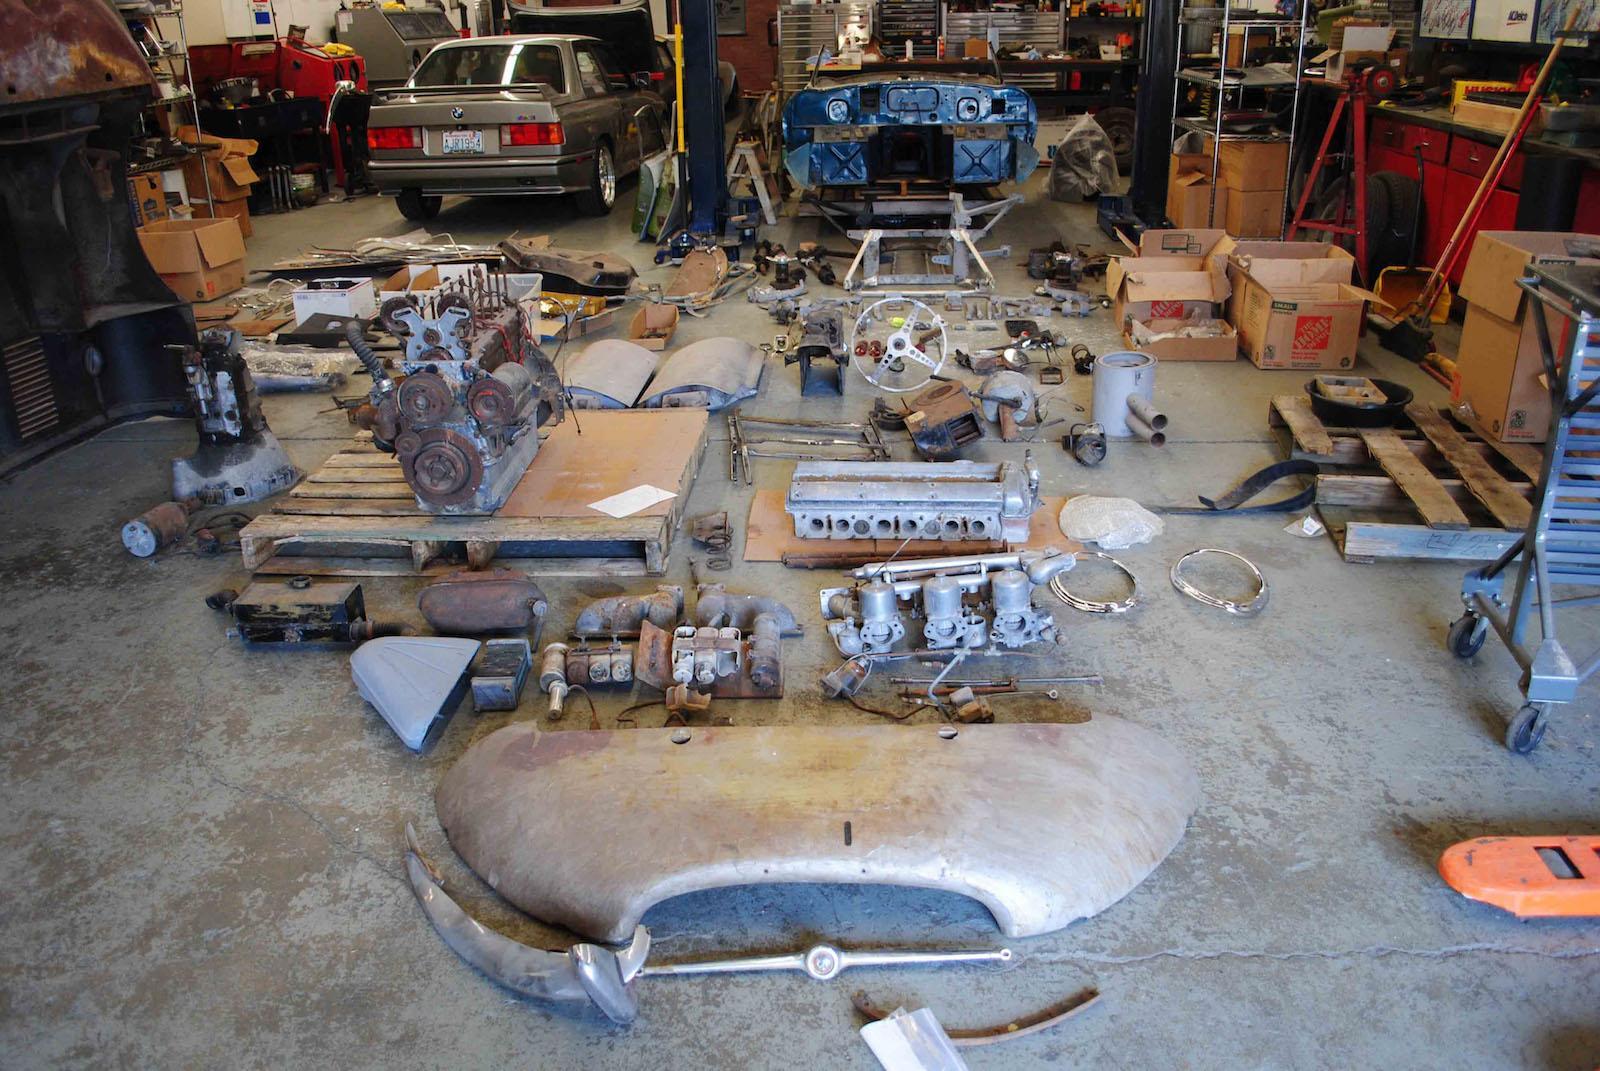 Barons to auction Jaguar E-type 'restoration kit'